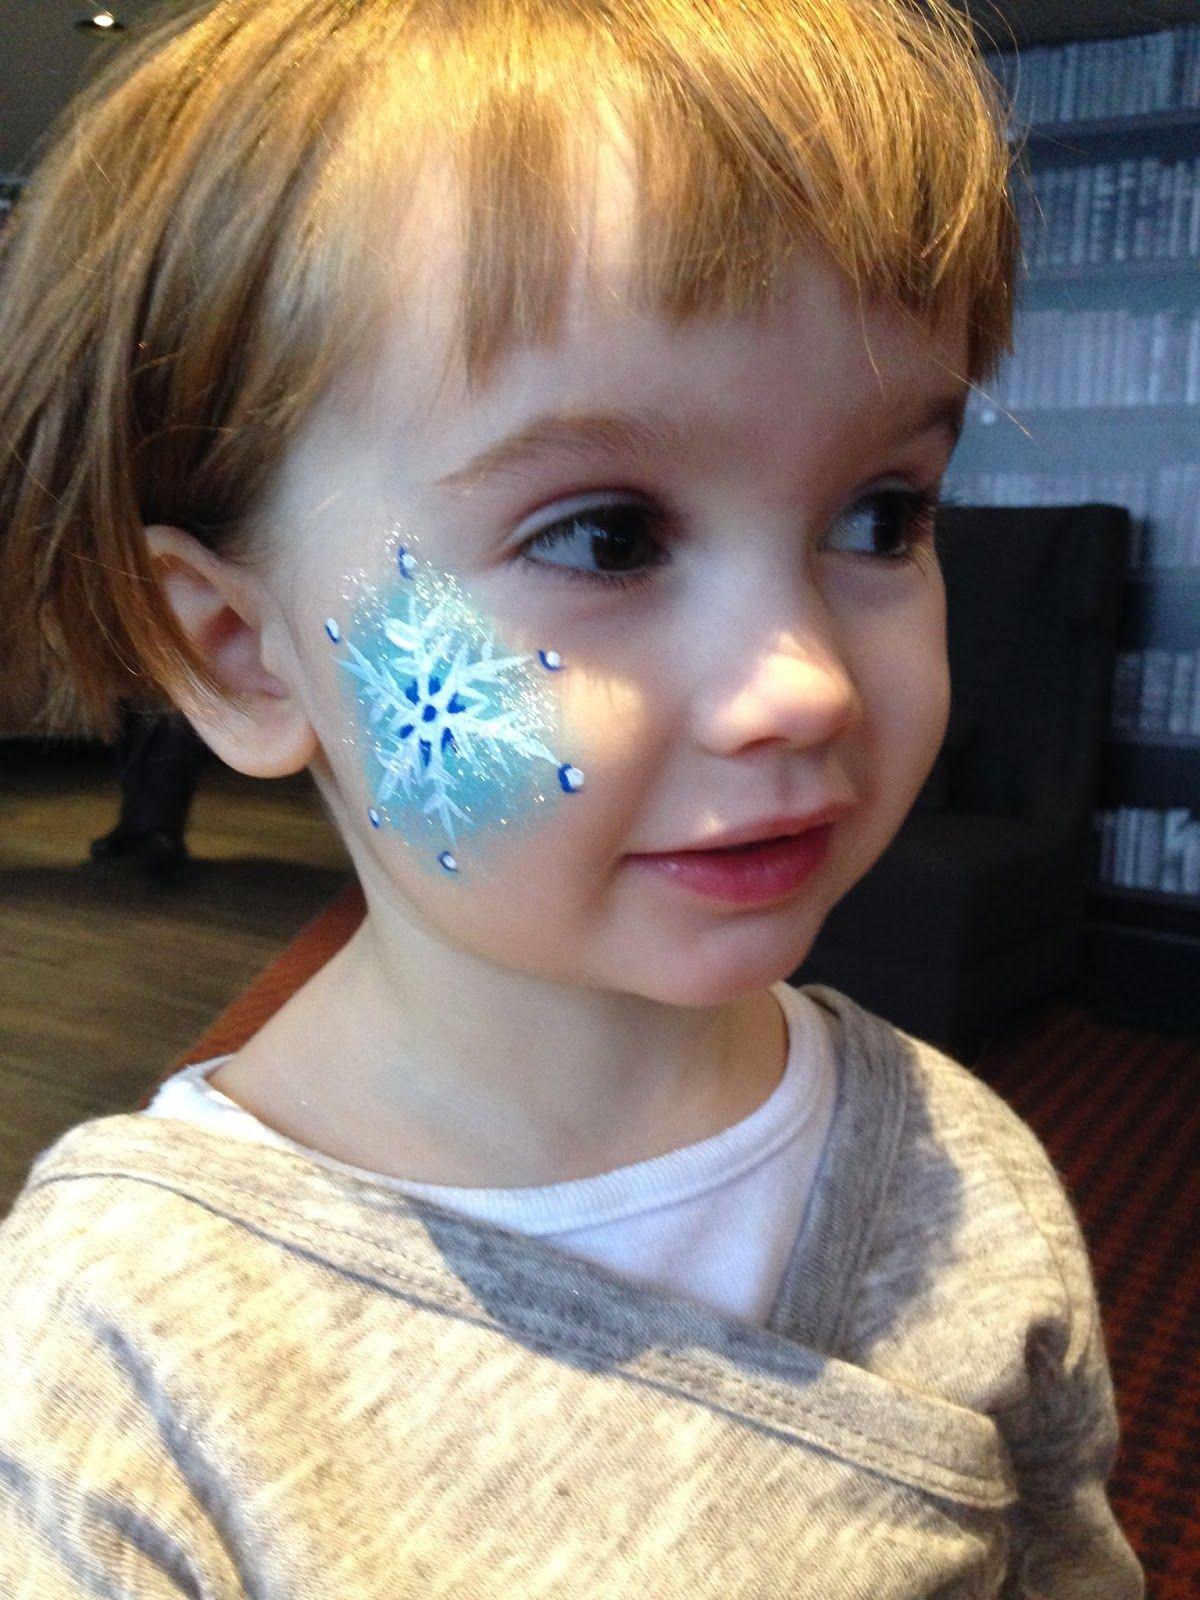 snowflake face paint google search schminken pinterest kinderschminken kinderschminken. Black Bedroom Furniture Sets. Home Design Ideas